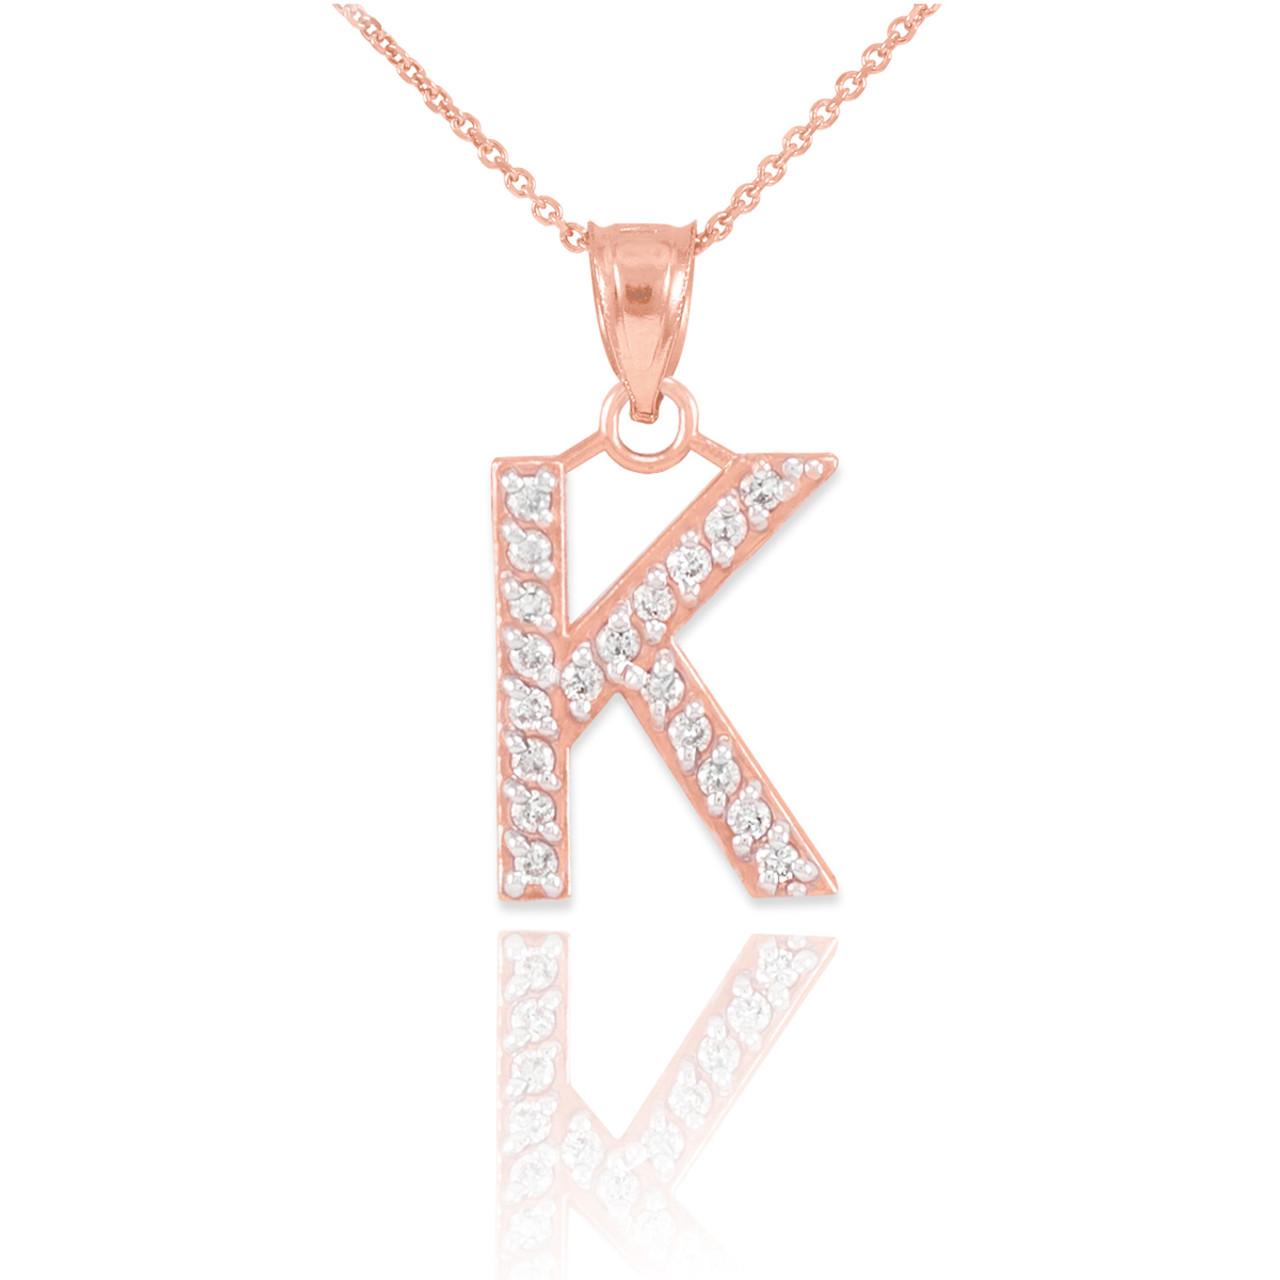 Rose gold letter k diamond initial pendant necklace aloadofball Images